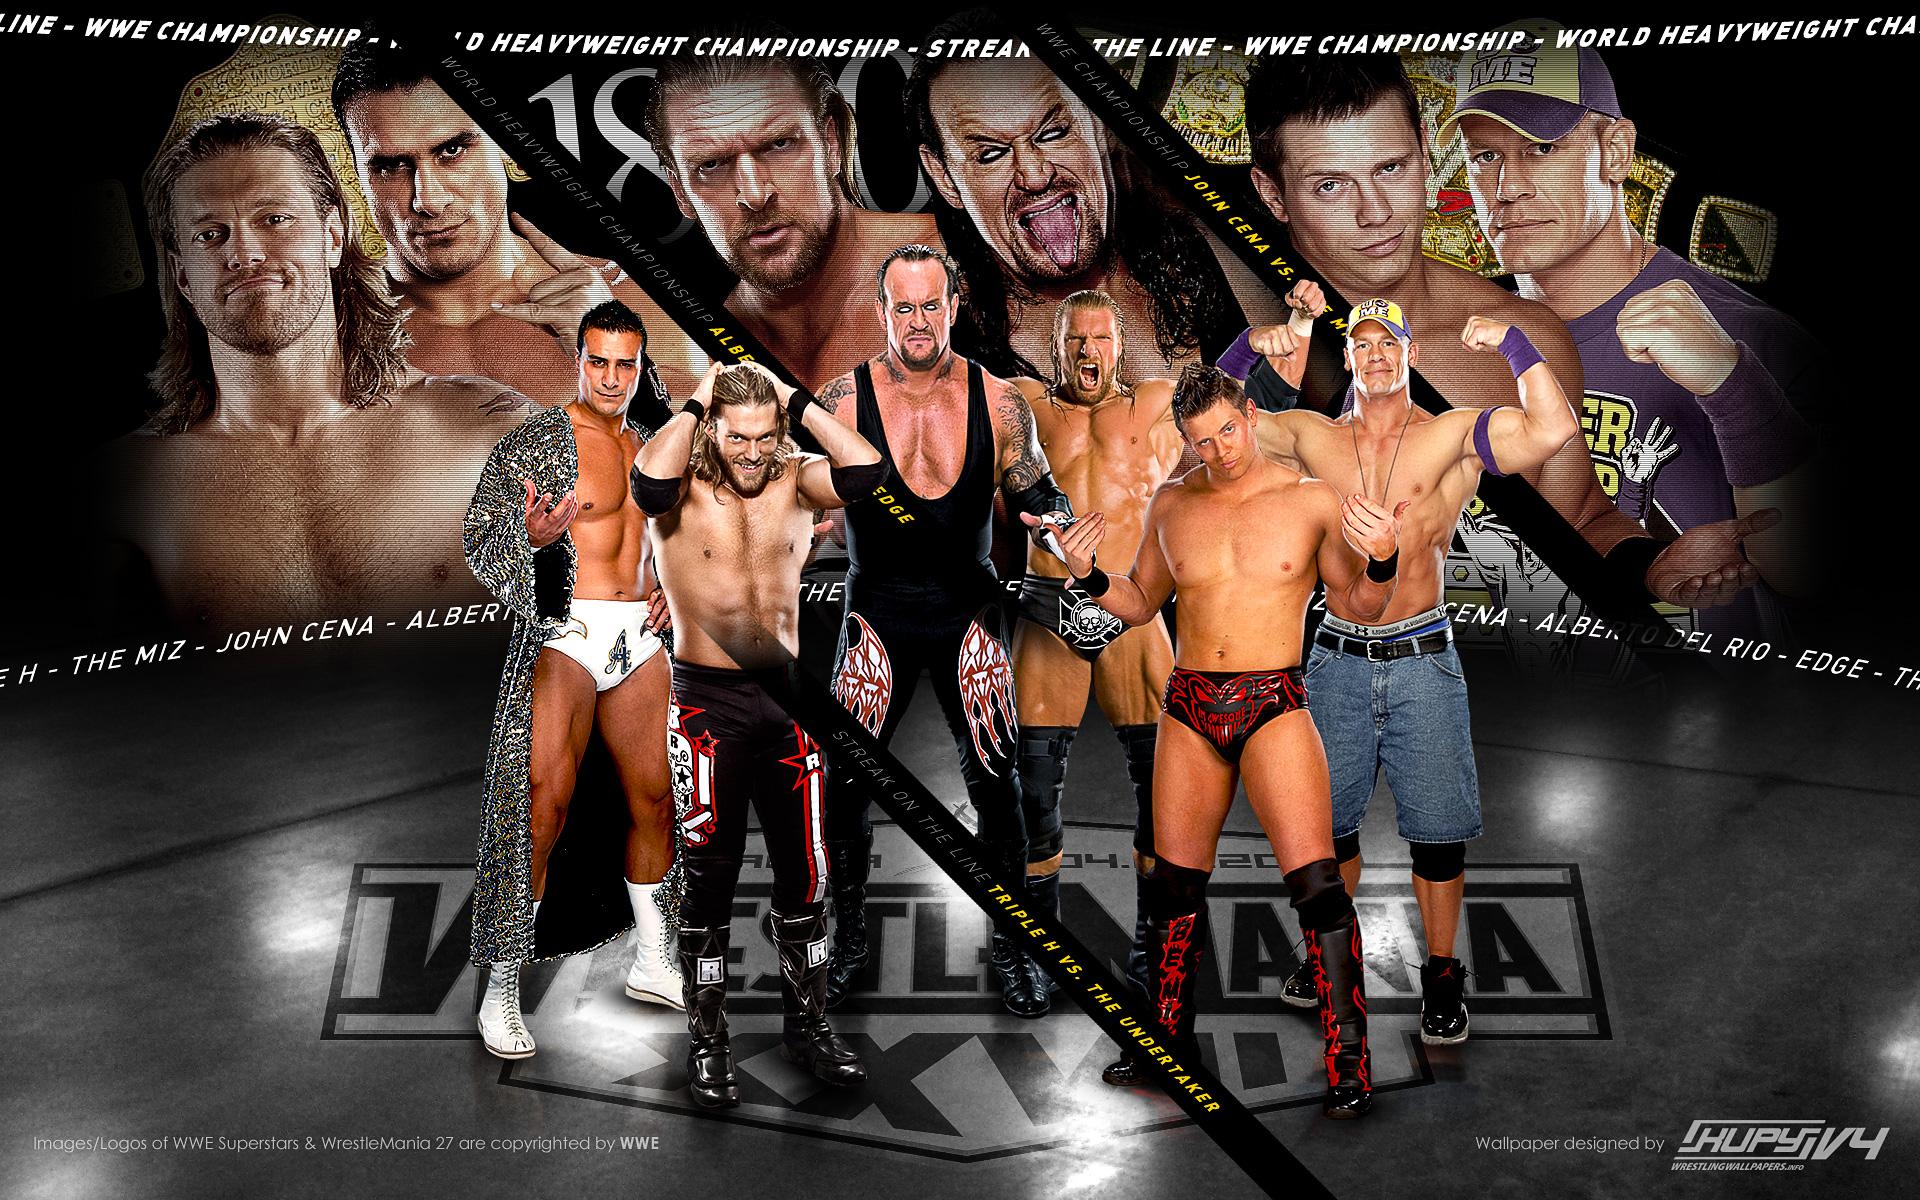 Road To Wrestlemania 27 Triple Main Event Wallpaper Kupy